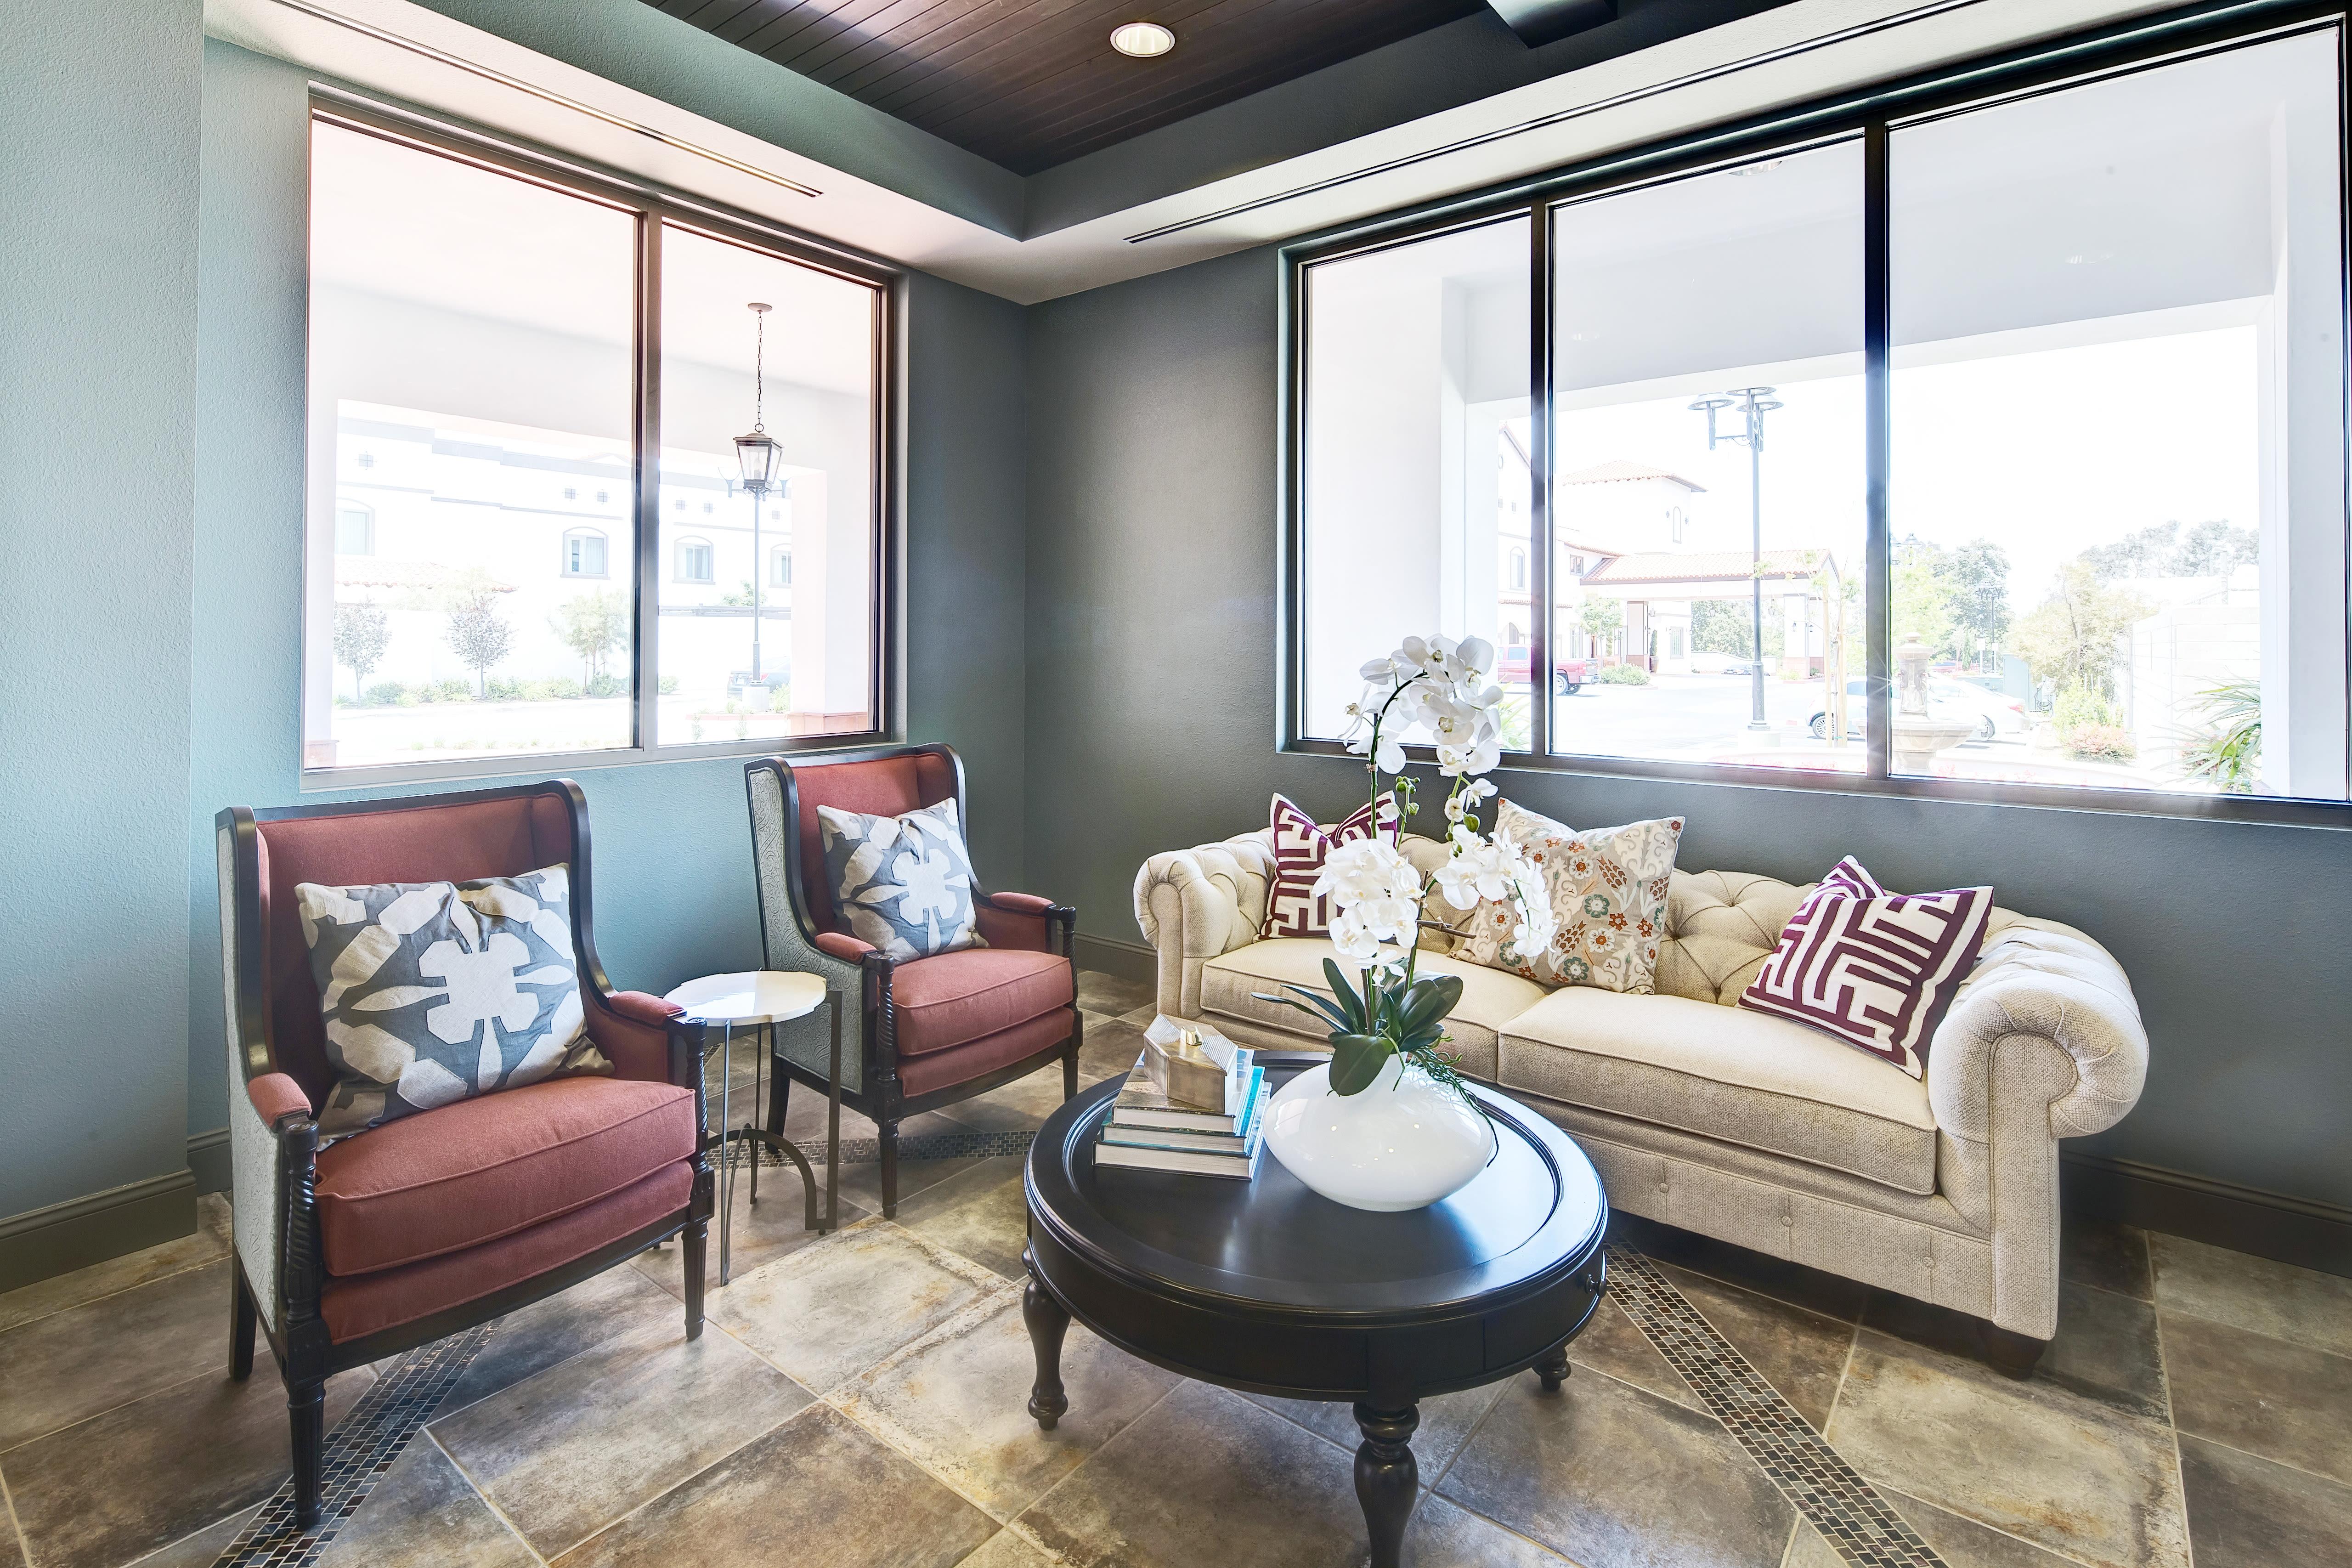 Living space at senior living community in Torrance, California